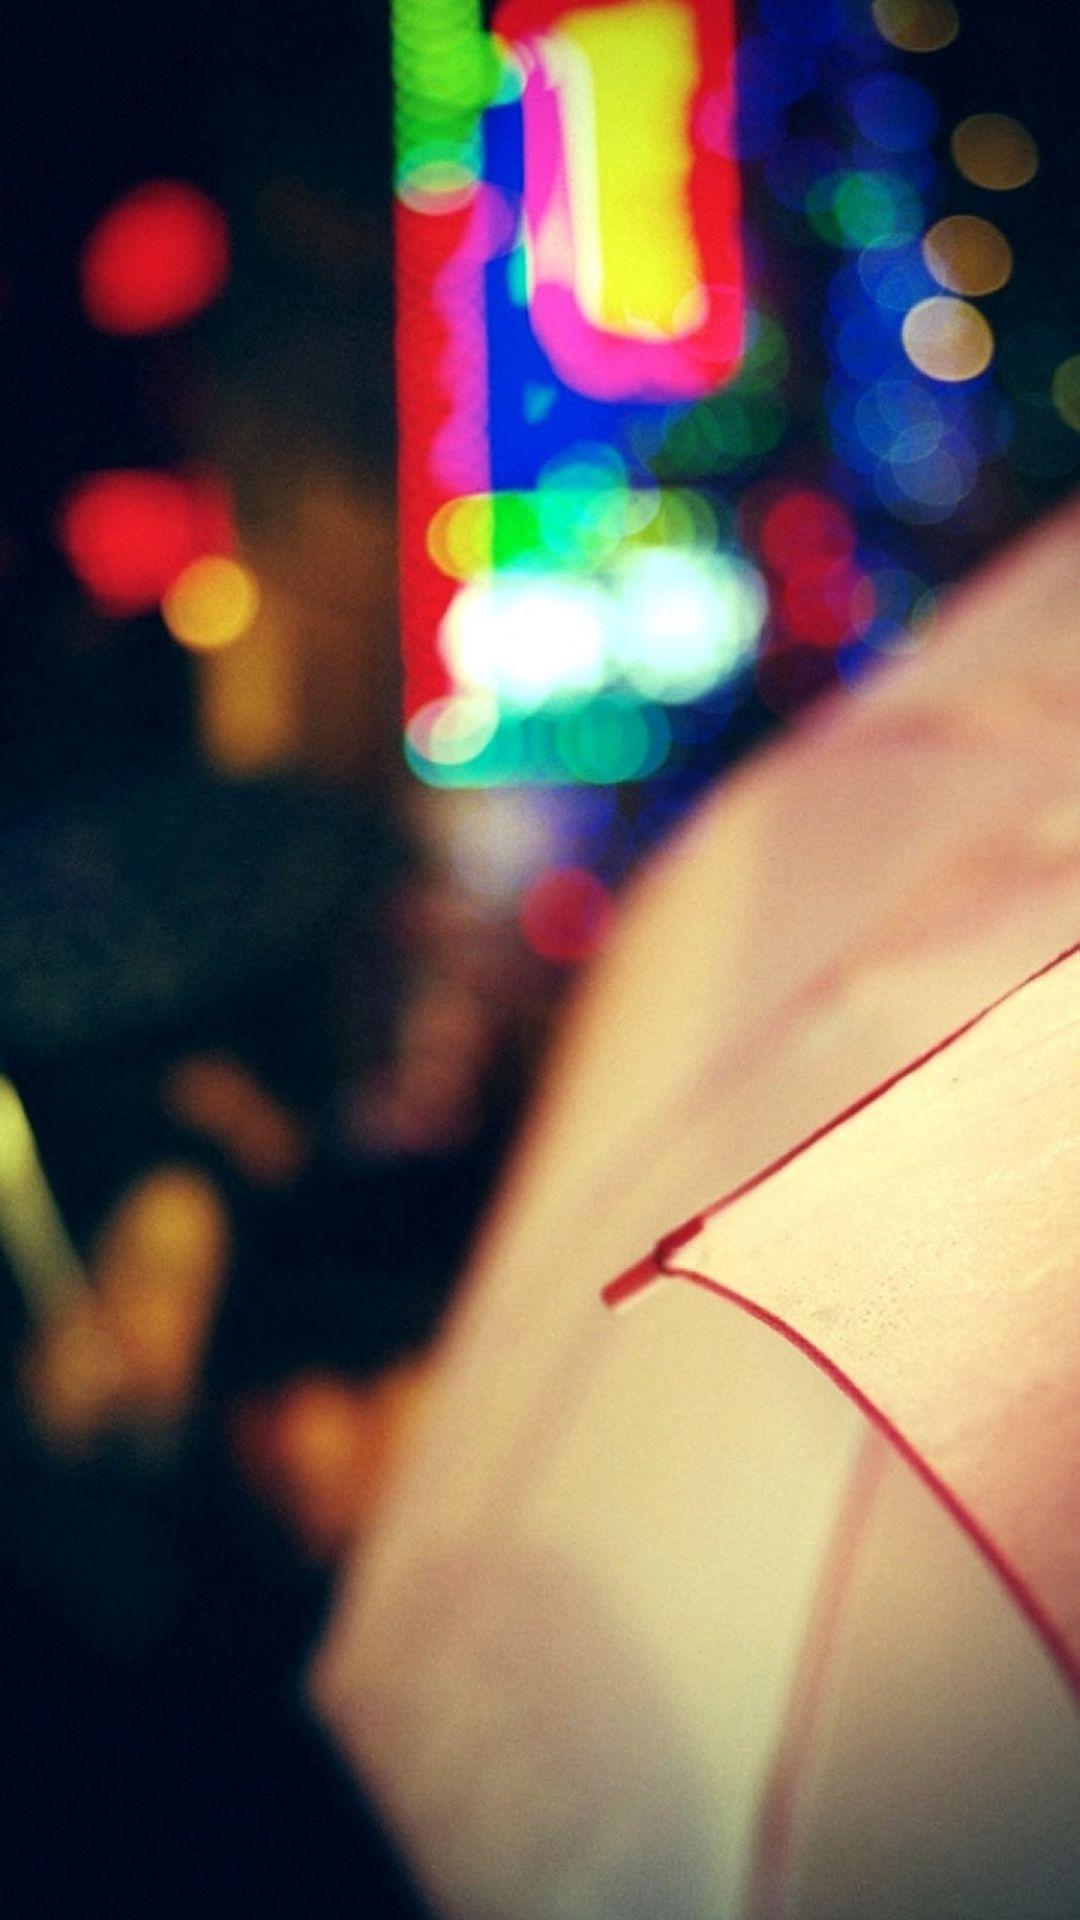 City Umbrella Bokeh iPhone 6 Plus HD Wallpaper